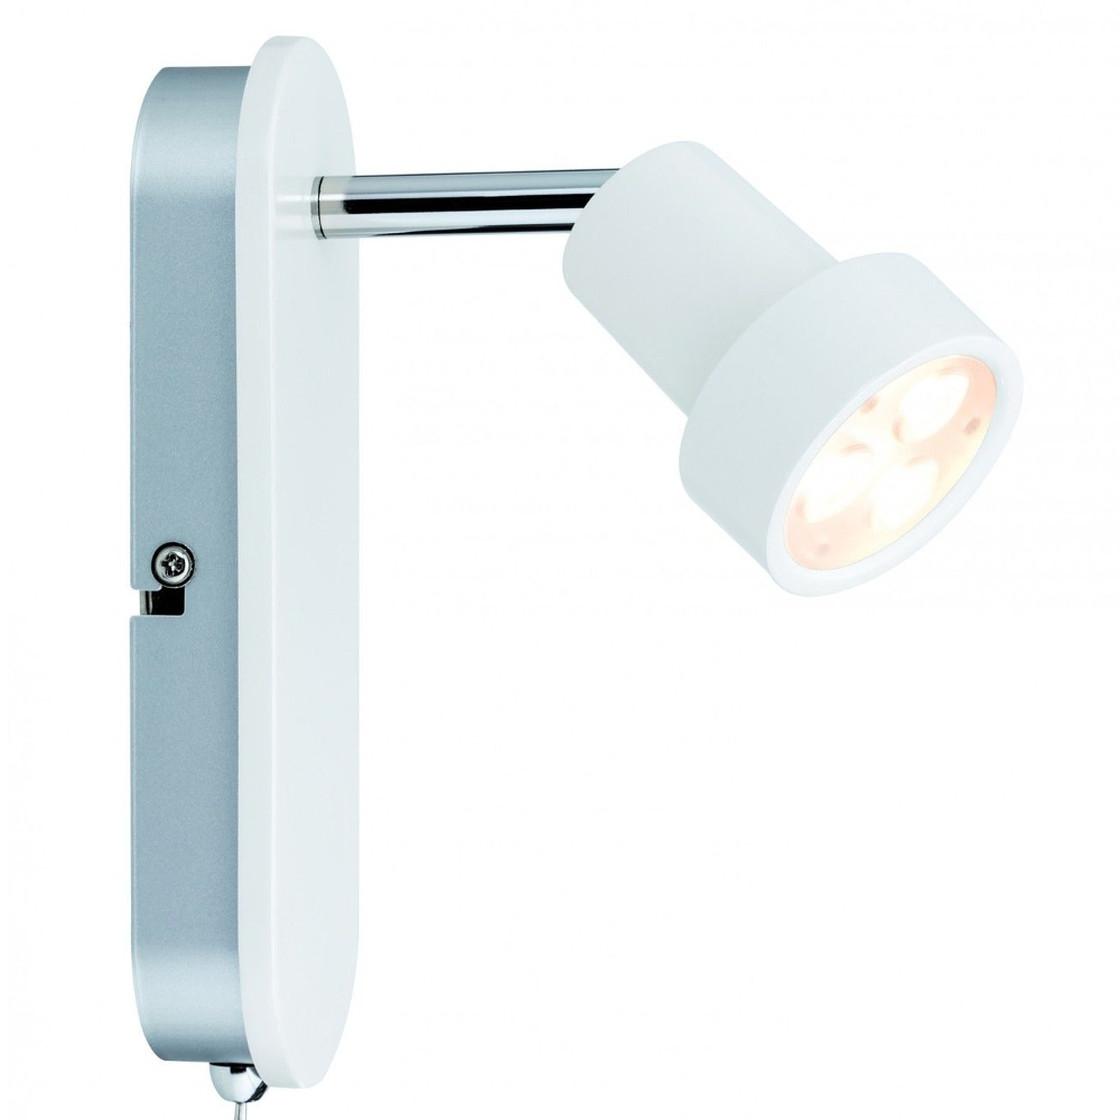 paulmann arioso led strahler spotlights 3 w wei inkl leuchtm 29 99. Black Bedroom Furniture Sets. Home Design Ideas